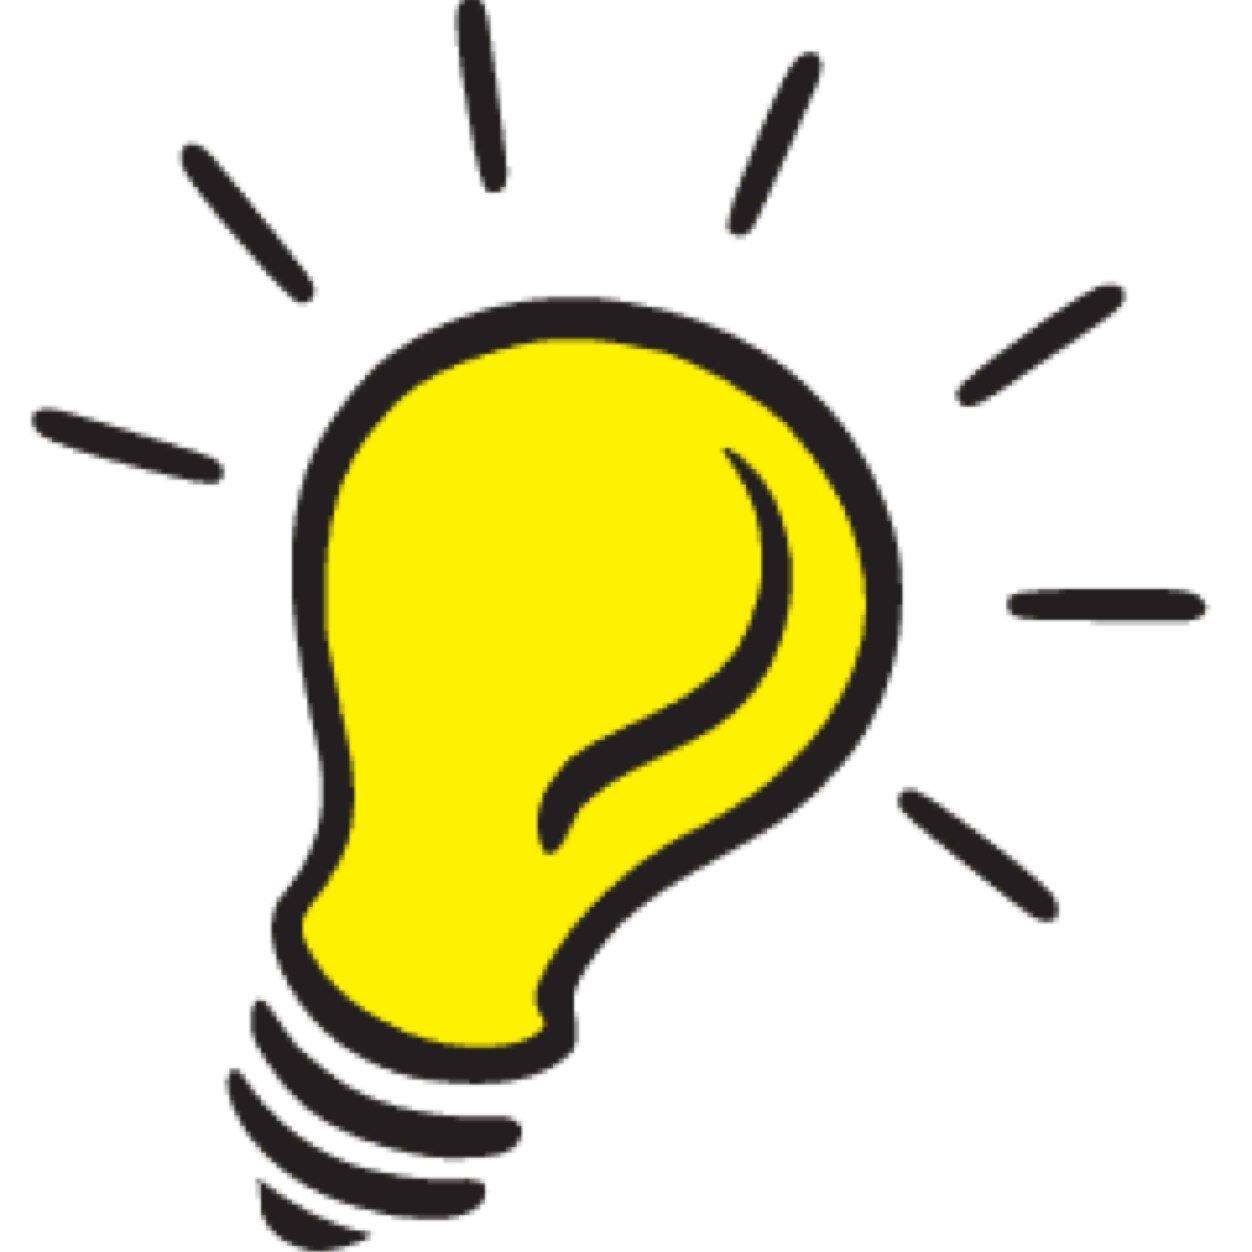 1252x1252 Black Light Bulb Clip Art. Light Bulb Invention Clip Art Idea